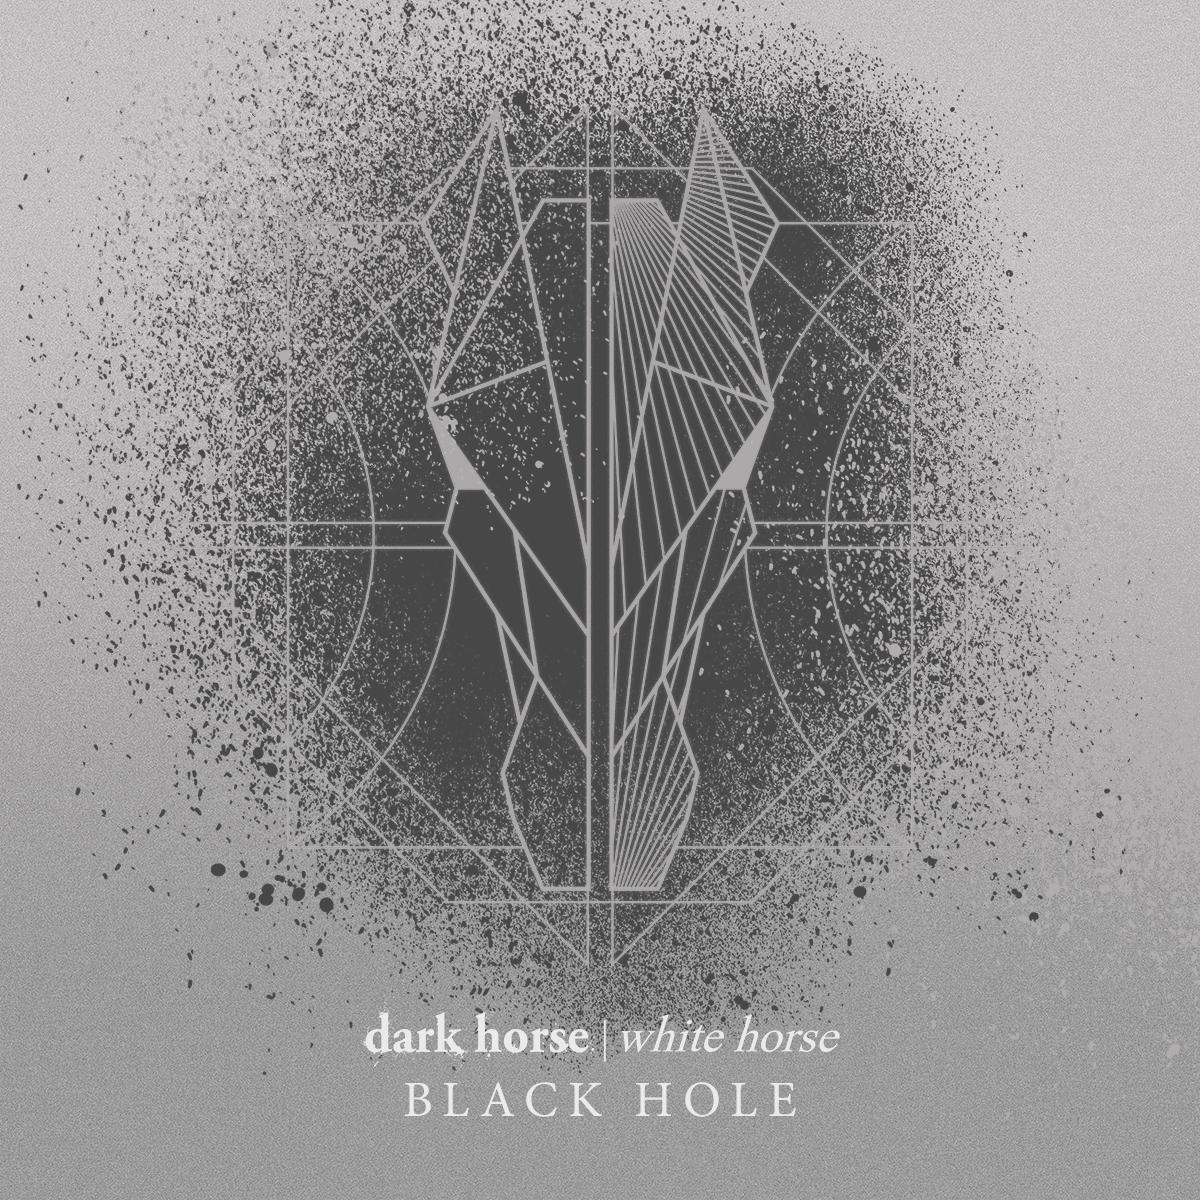 Dark Horse White Horse Premiere Black Hole The Progspace